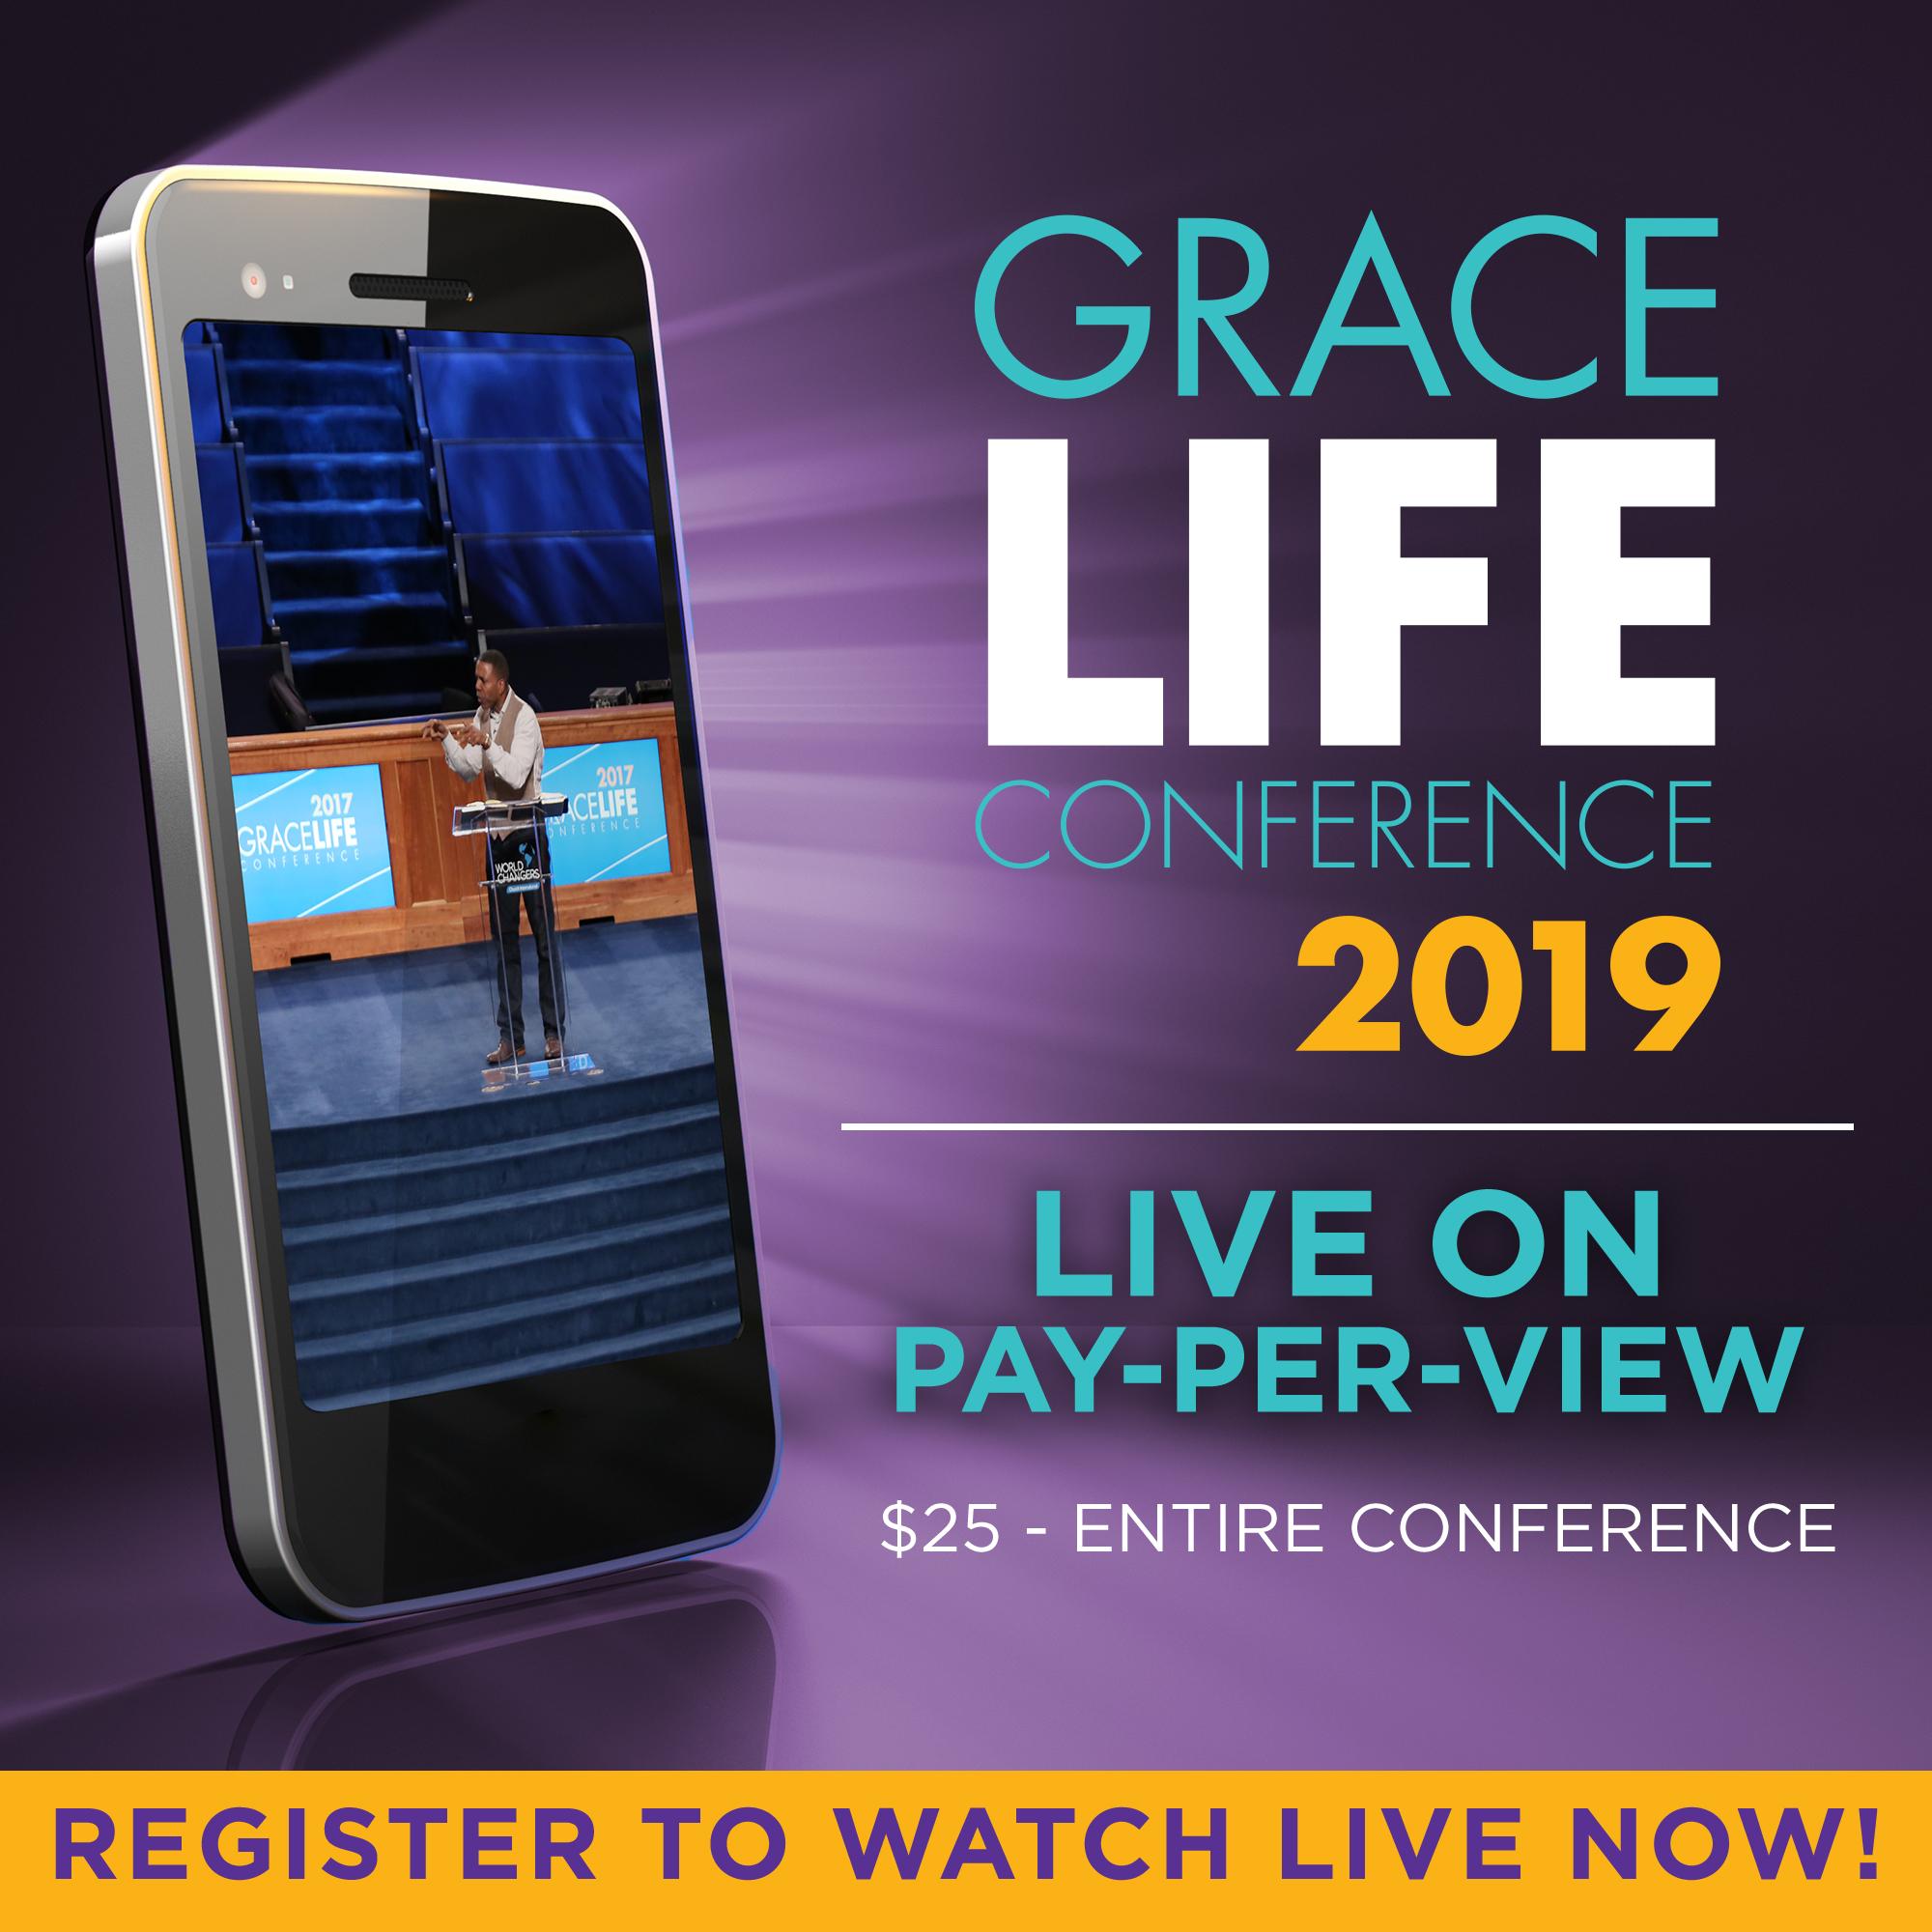 Watch Gracelife Live